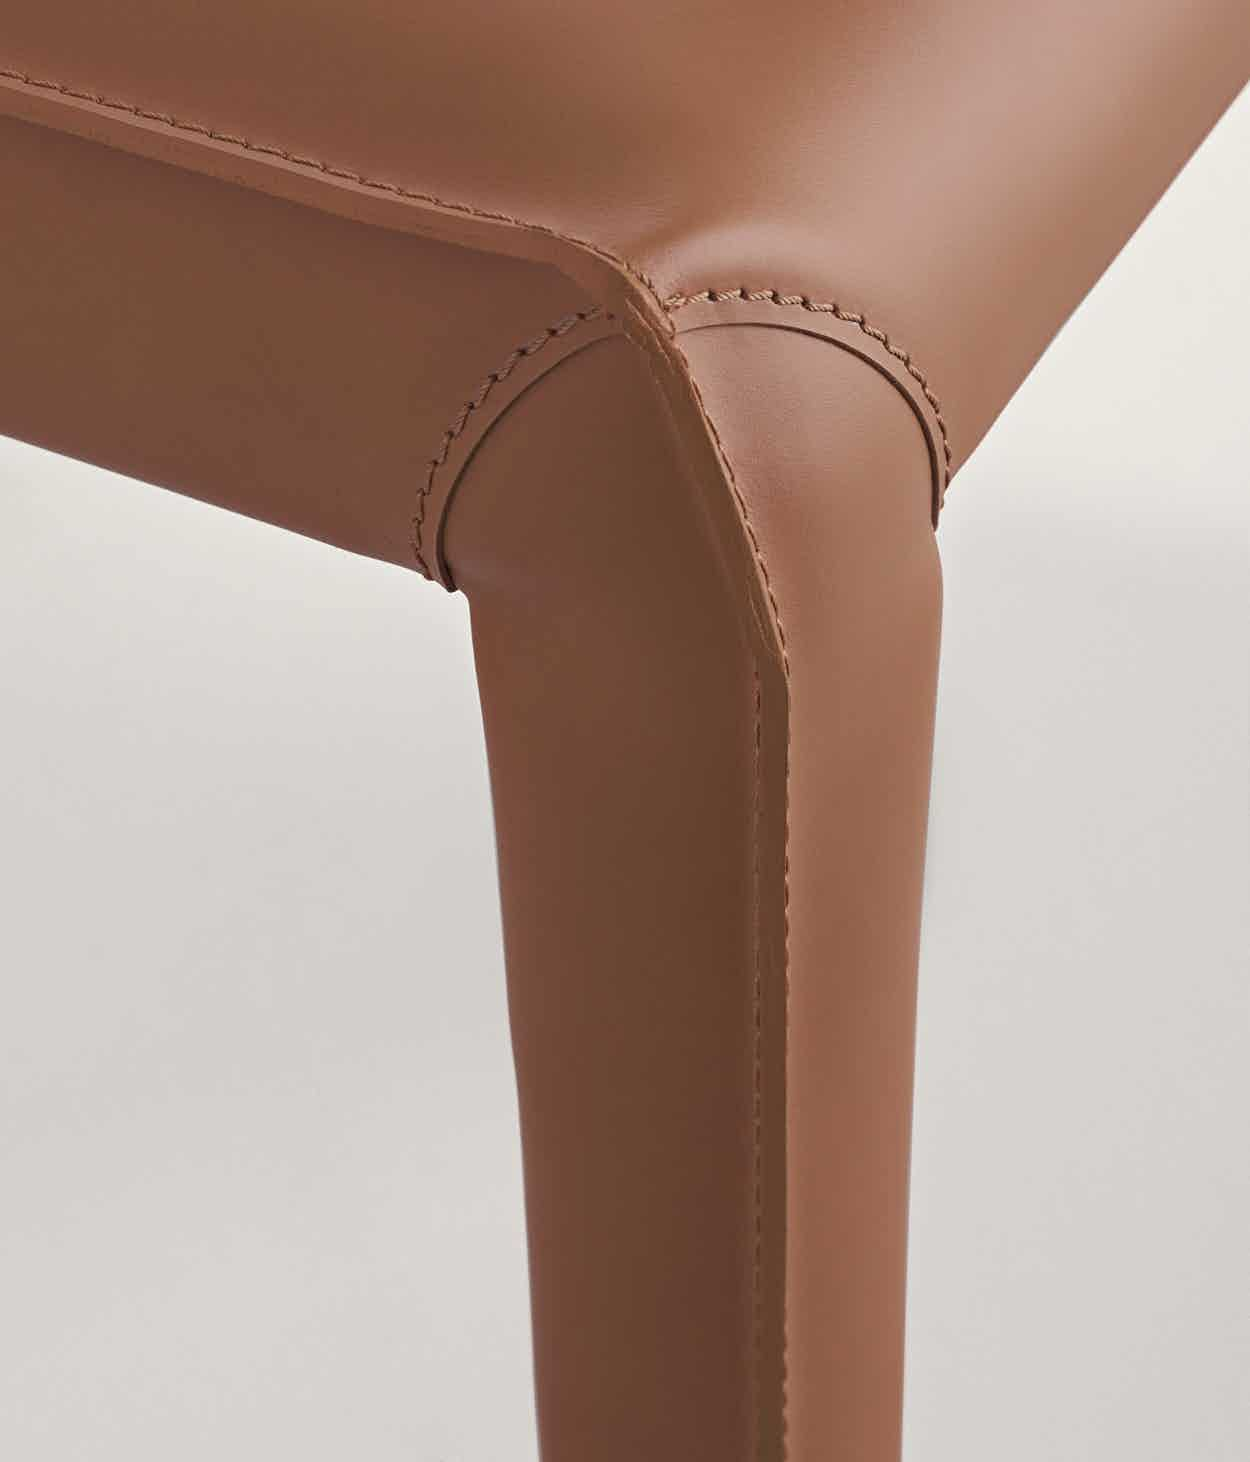 Frag-furniture-detail-musa-chair-institu-haute-living